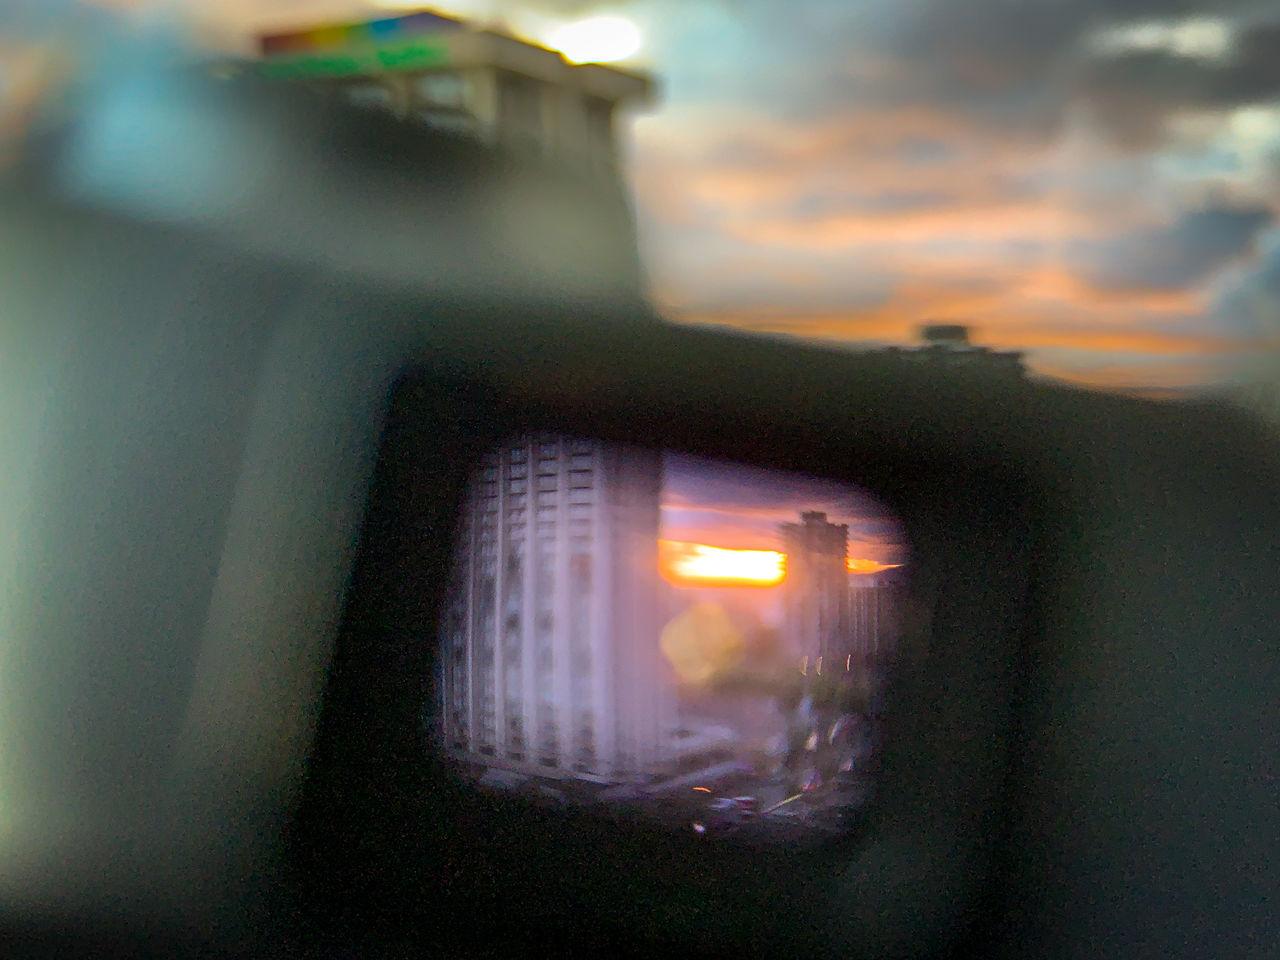 ILLUMINATED CAR AGAINST SKY DURING SUNSET SEEN THROUGH WINDOW